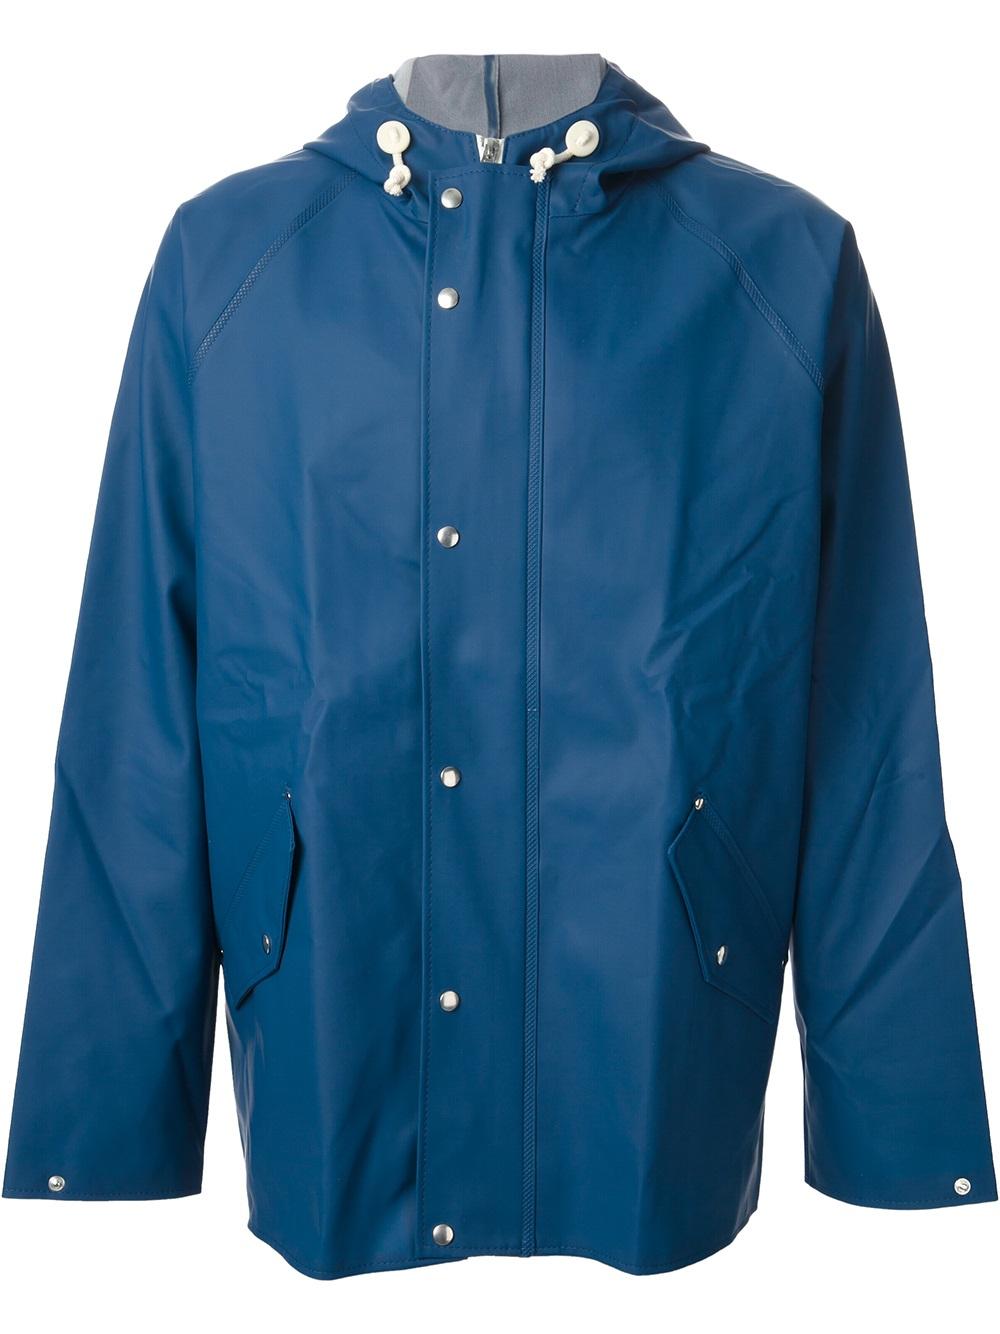 Norse Projects Elka Jacket In Blue For Men Lyst